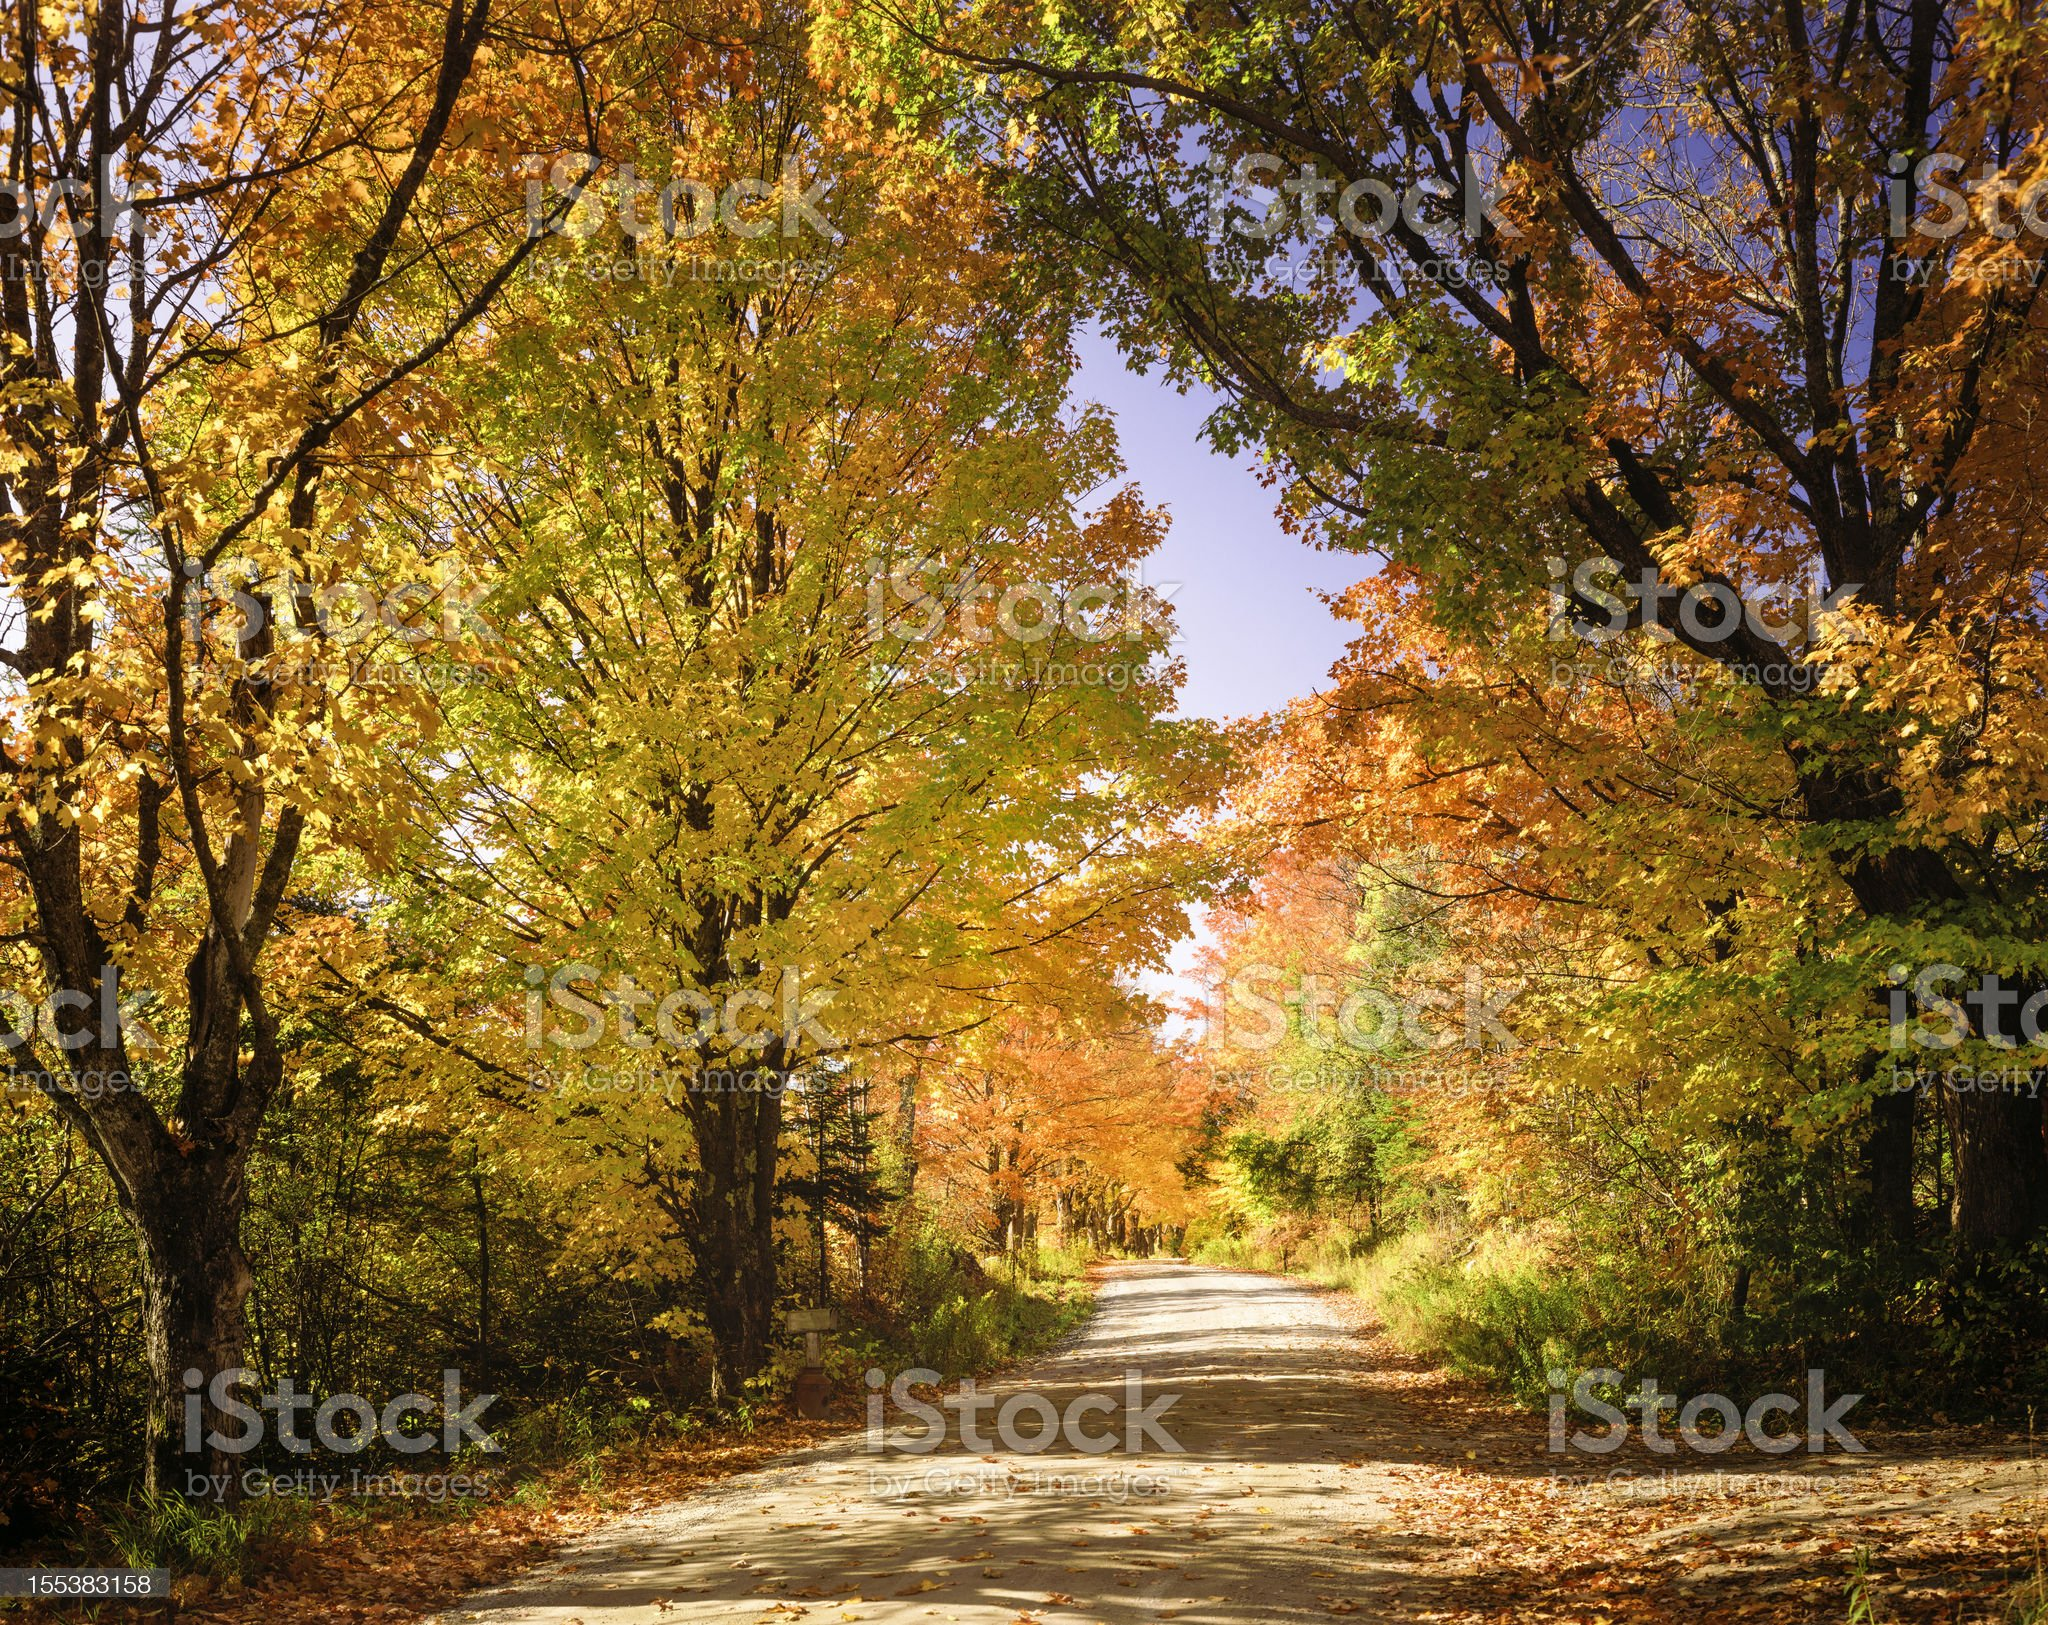 autumn foliage and country lane royalty-free stock photo